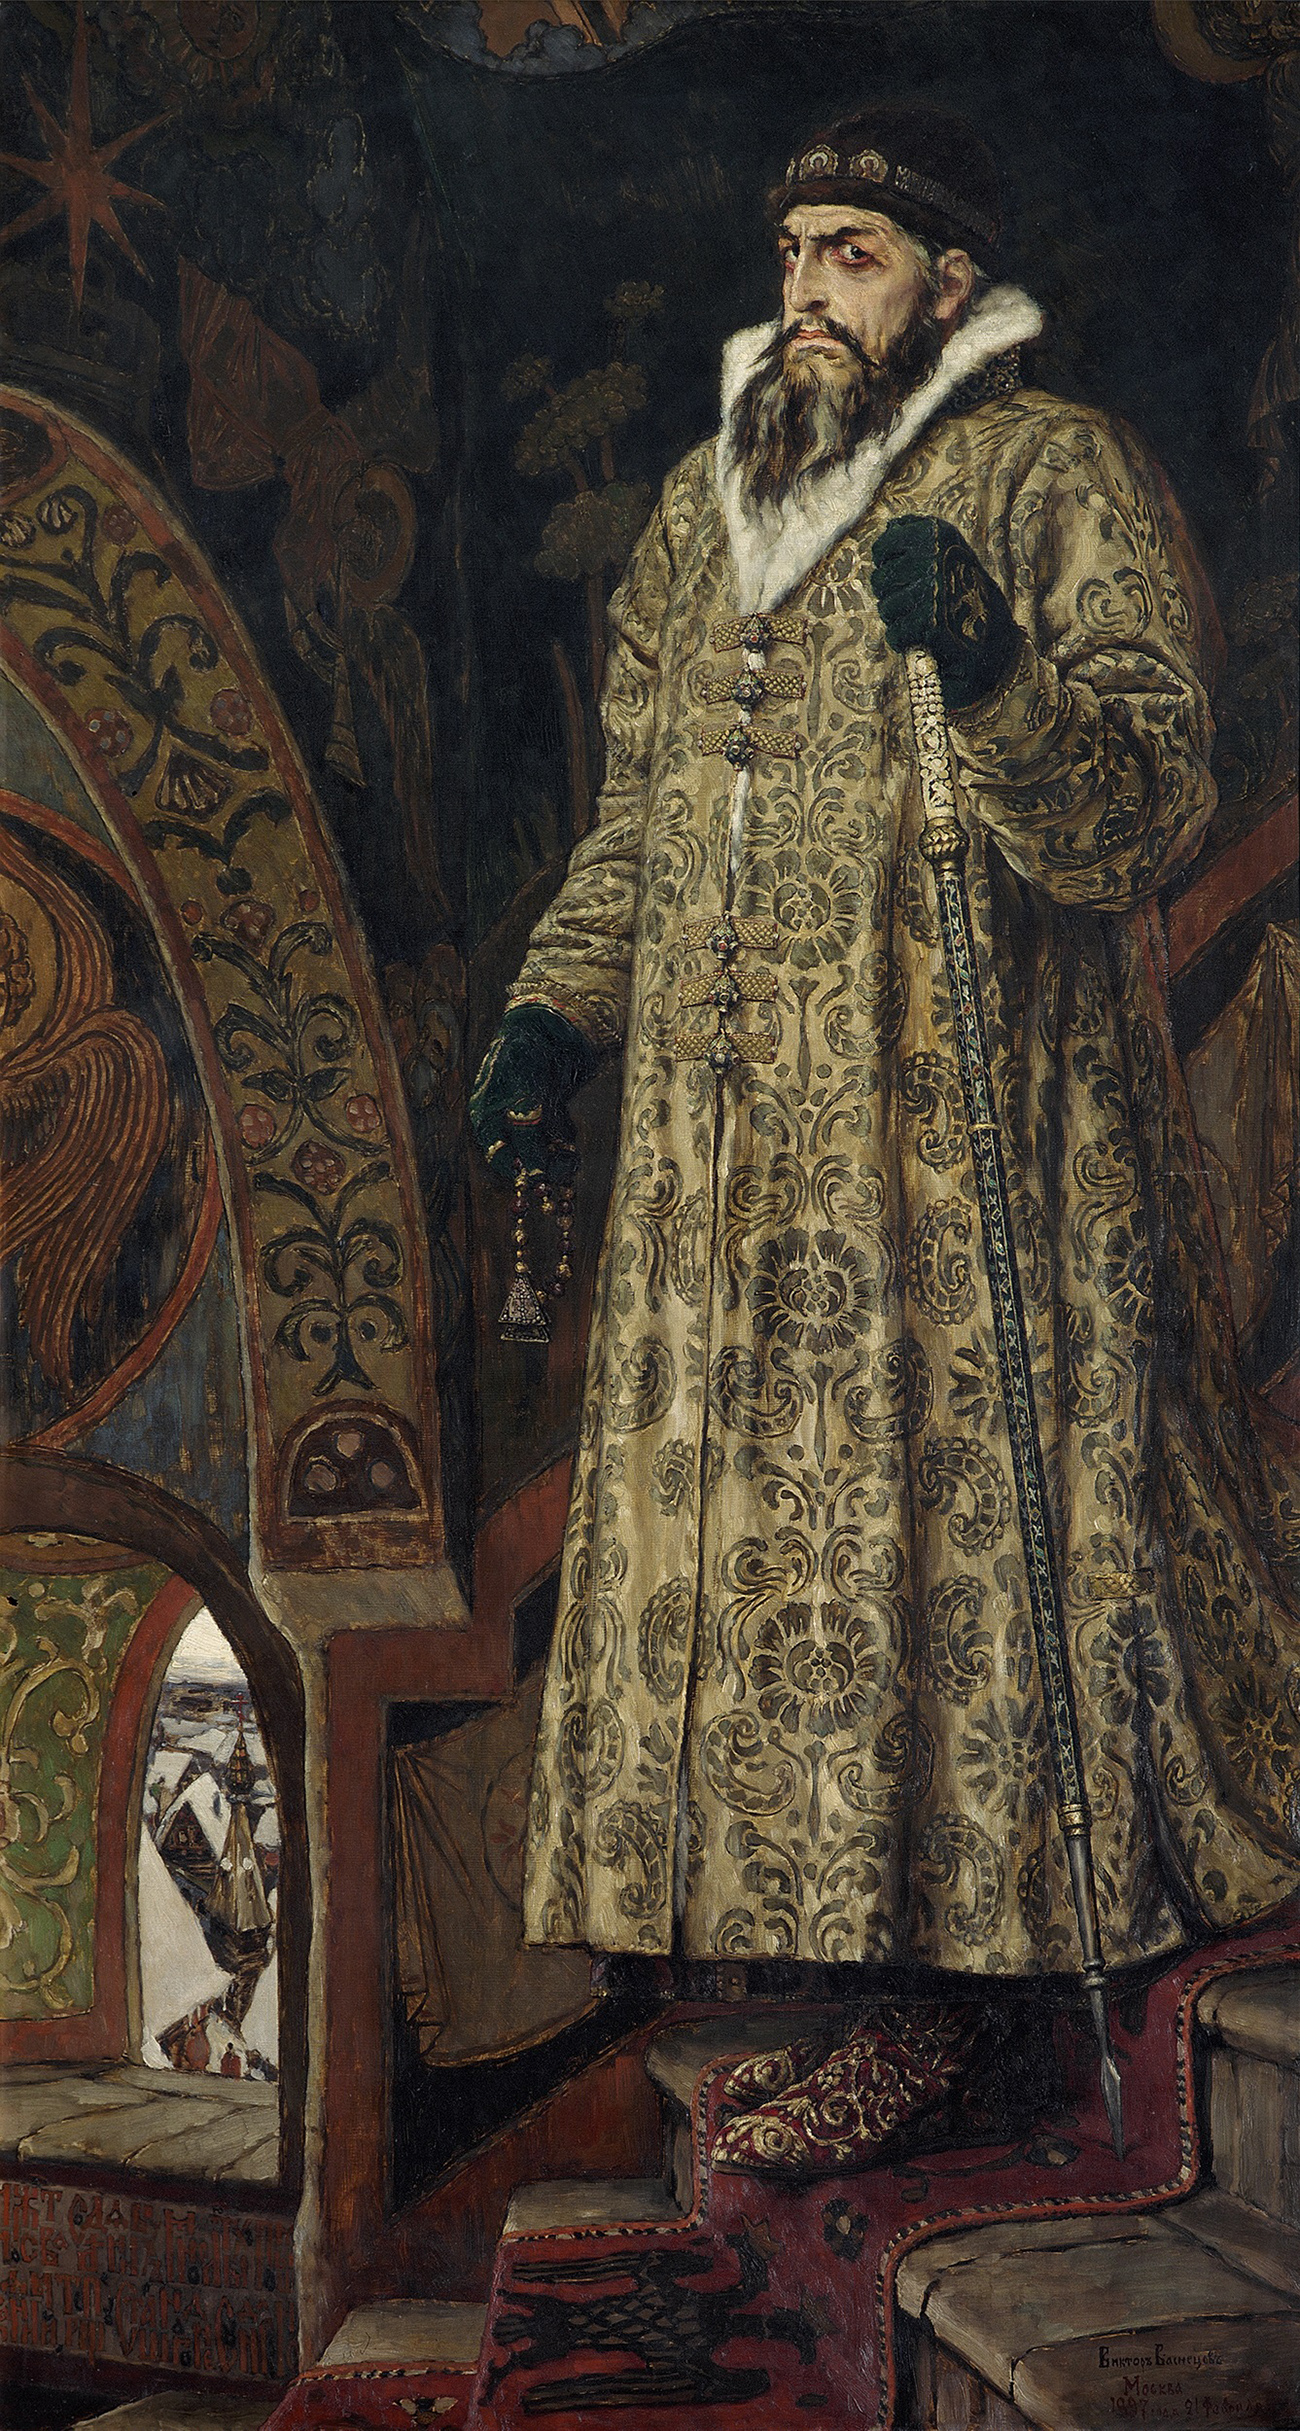 Tsar Ivan Vasilievich the Terrible, 1897 by Victor Vasnetsov. Source: State Tretyakov Gallery